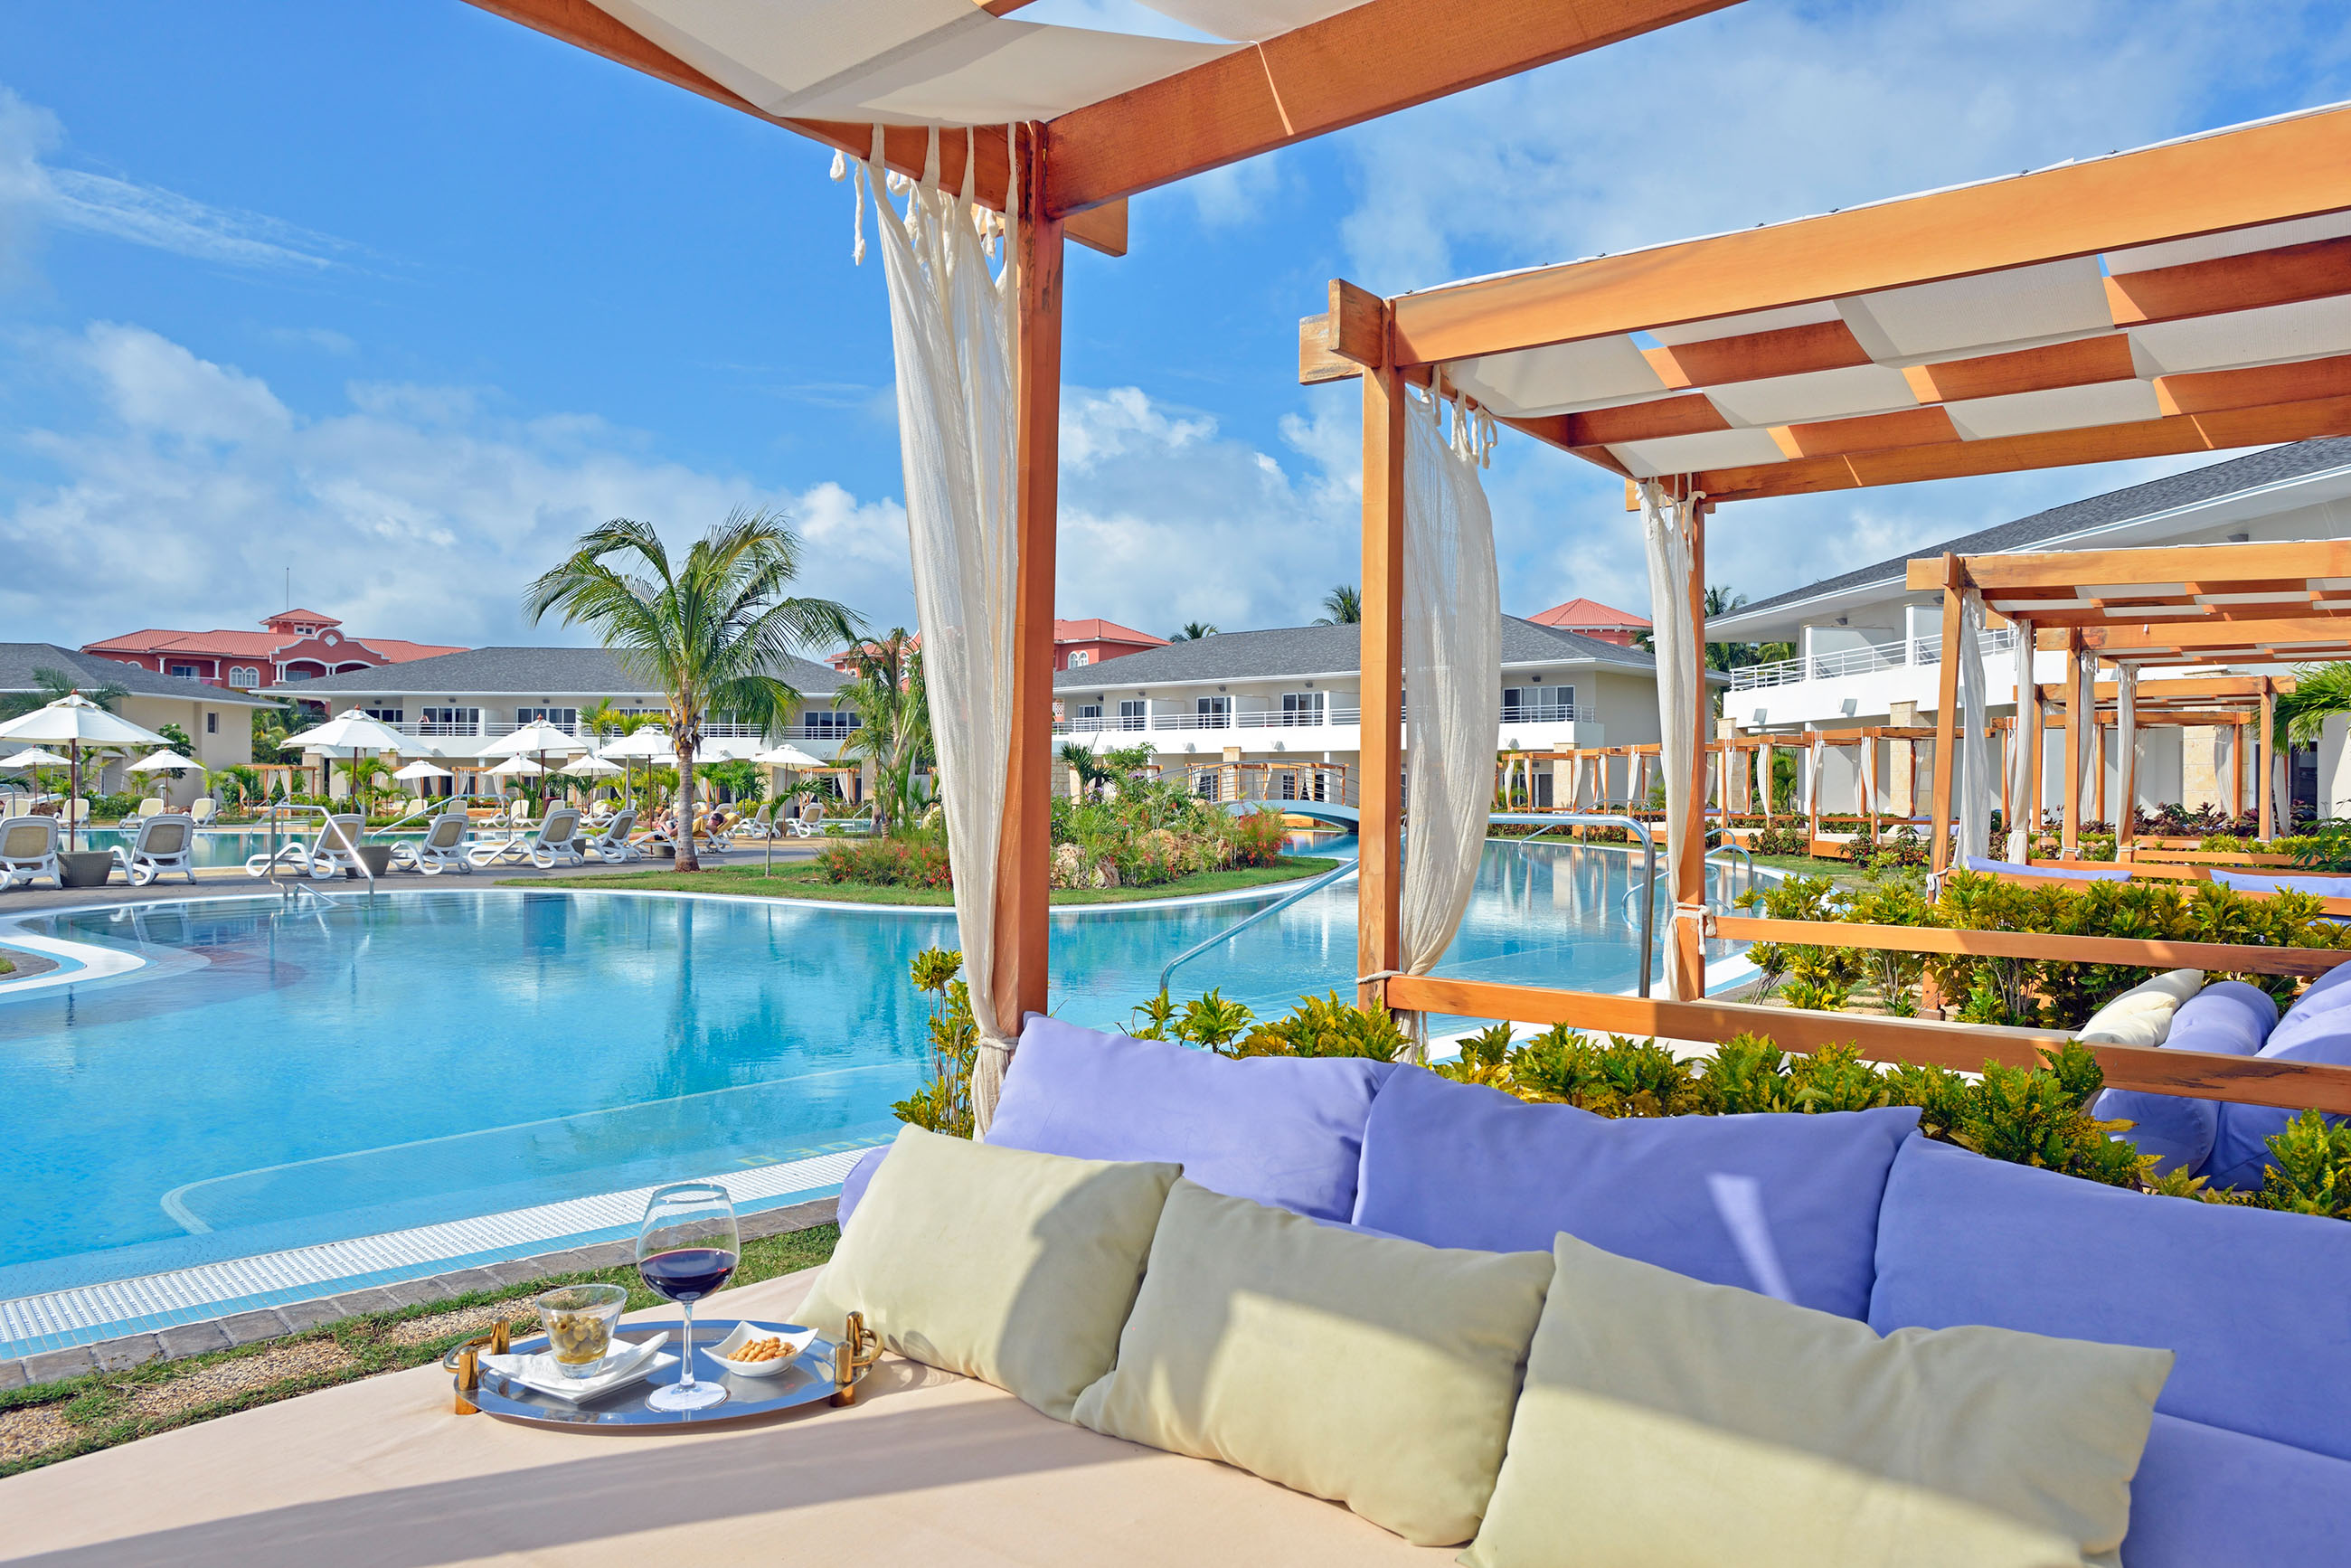 https://bubo.sk/uploads/galleries/7332/136paradisusprincesadelmar-beach_concierge_swim-up_pool_royal_service.jpg